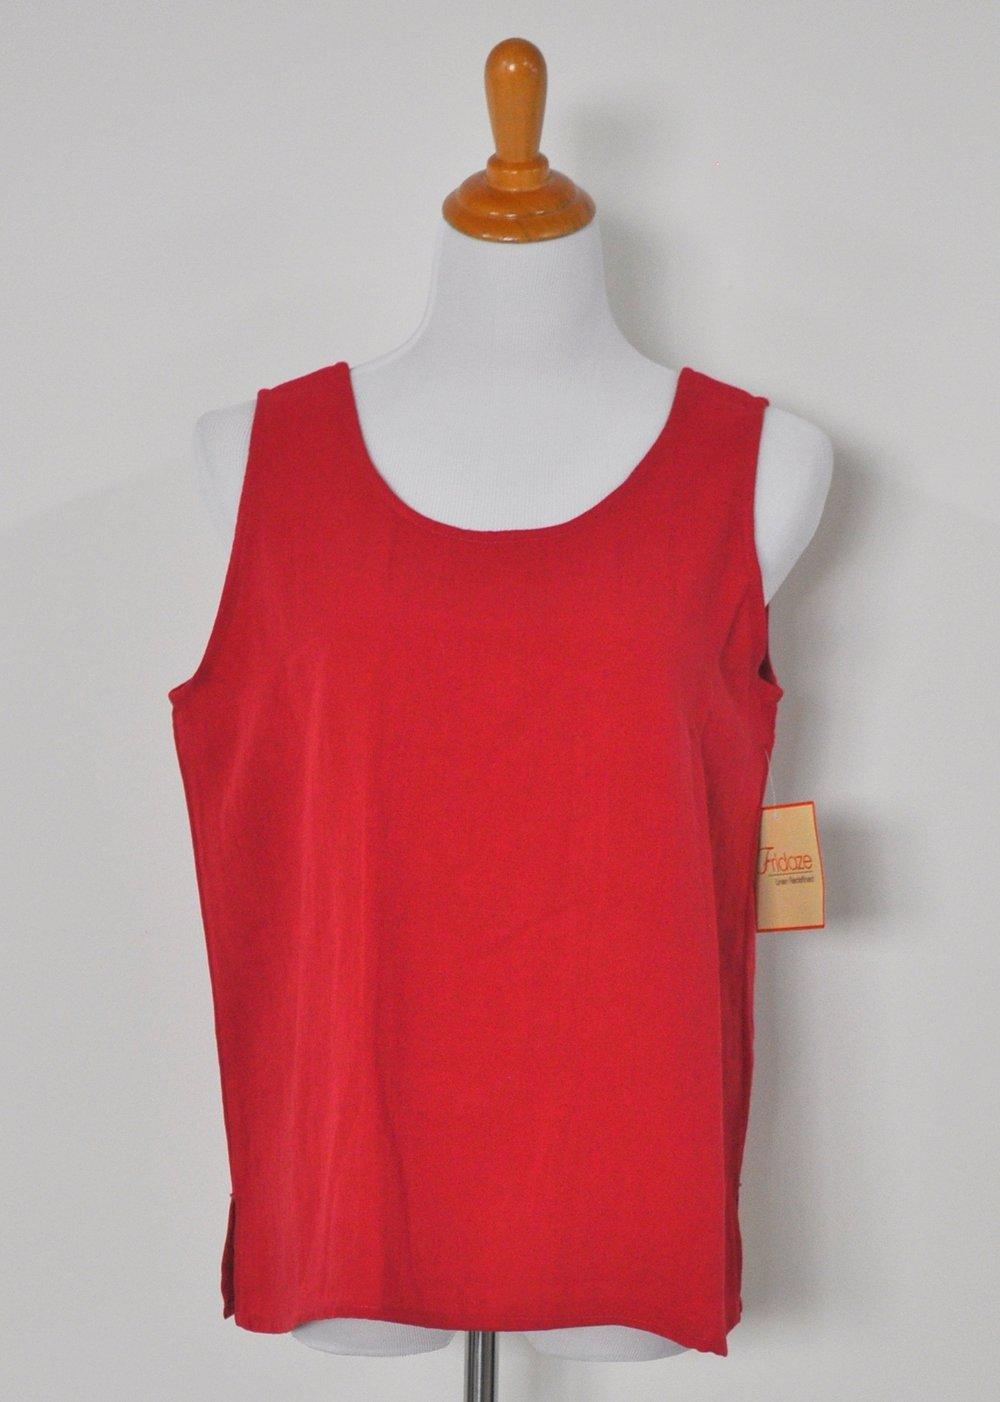 AATK03-Rouge.JPG